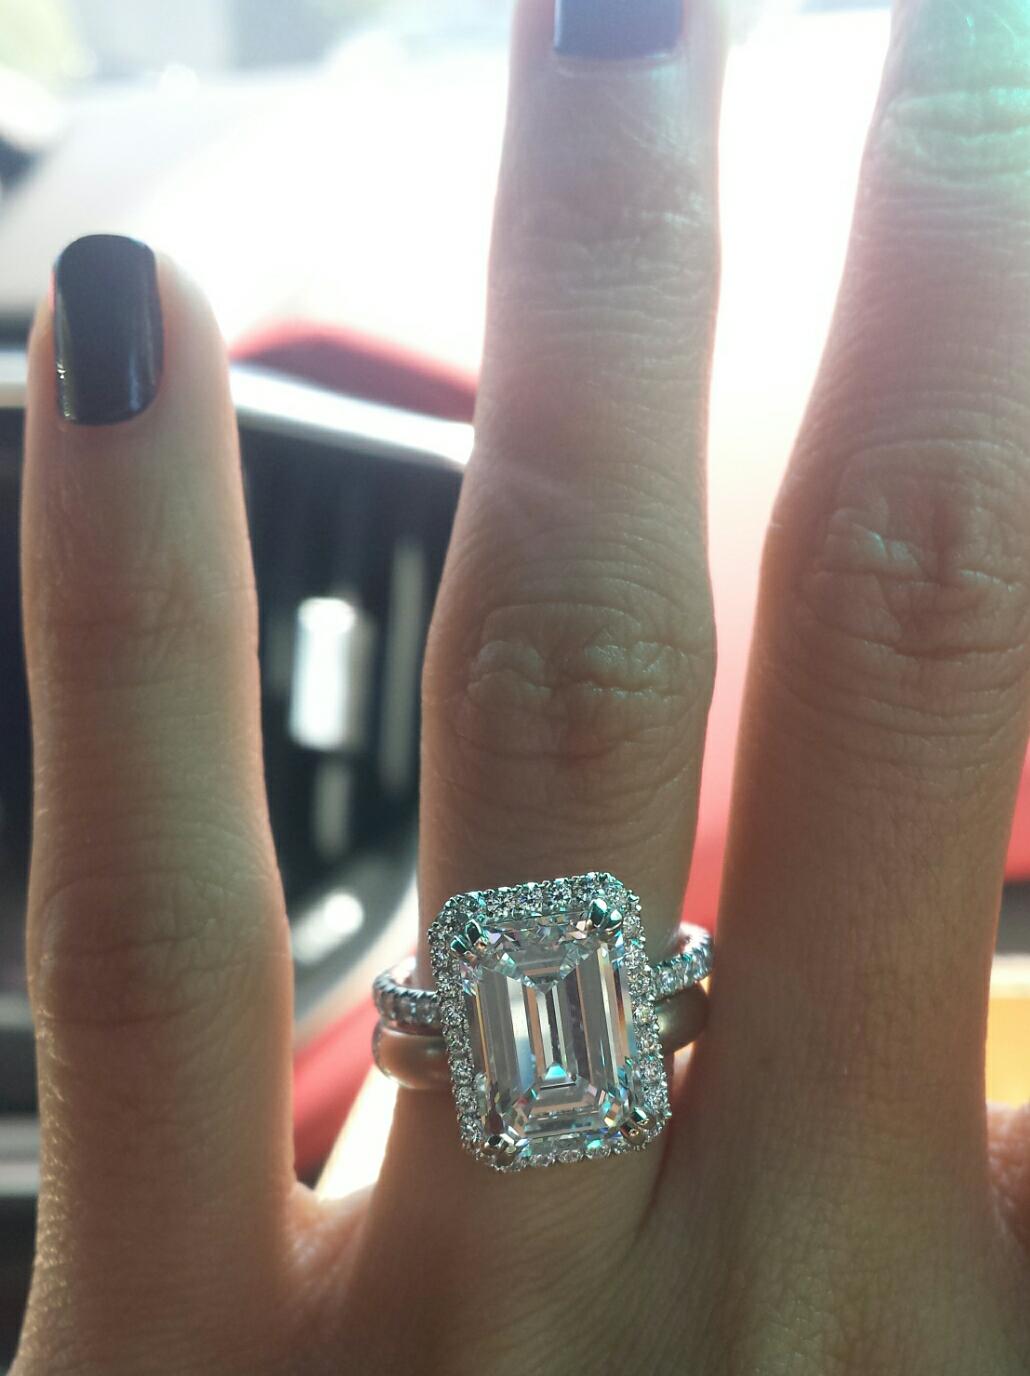 3 Carat Emerald Cut On Size 4 Finger Update^^  Weddingbee Emerald Cut  Ringsemerald Engagement